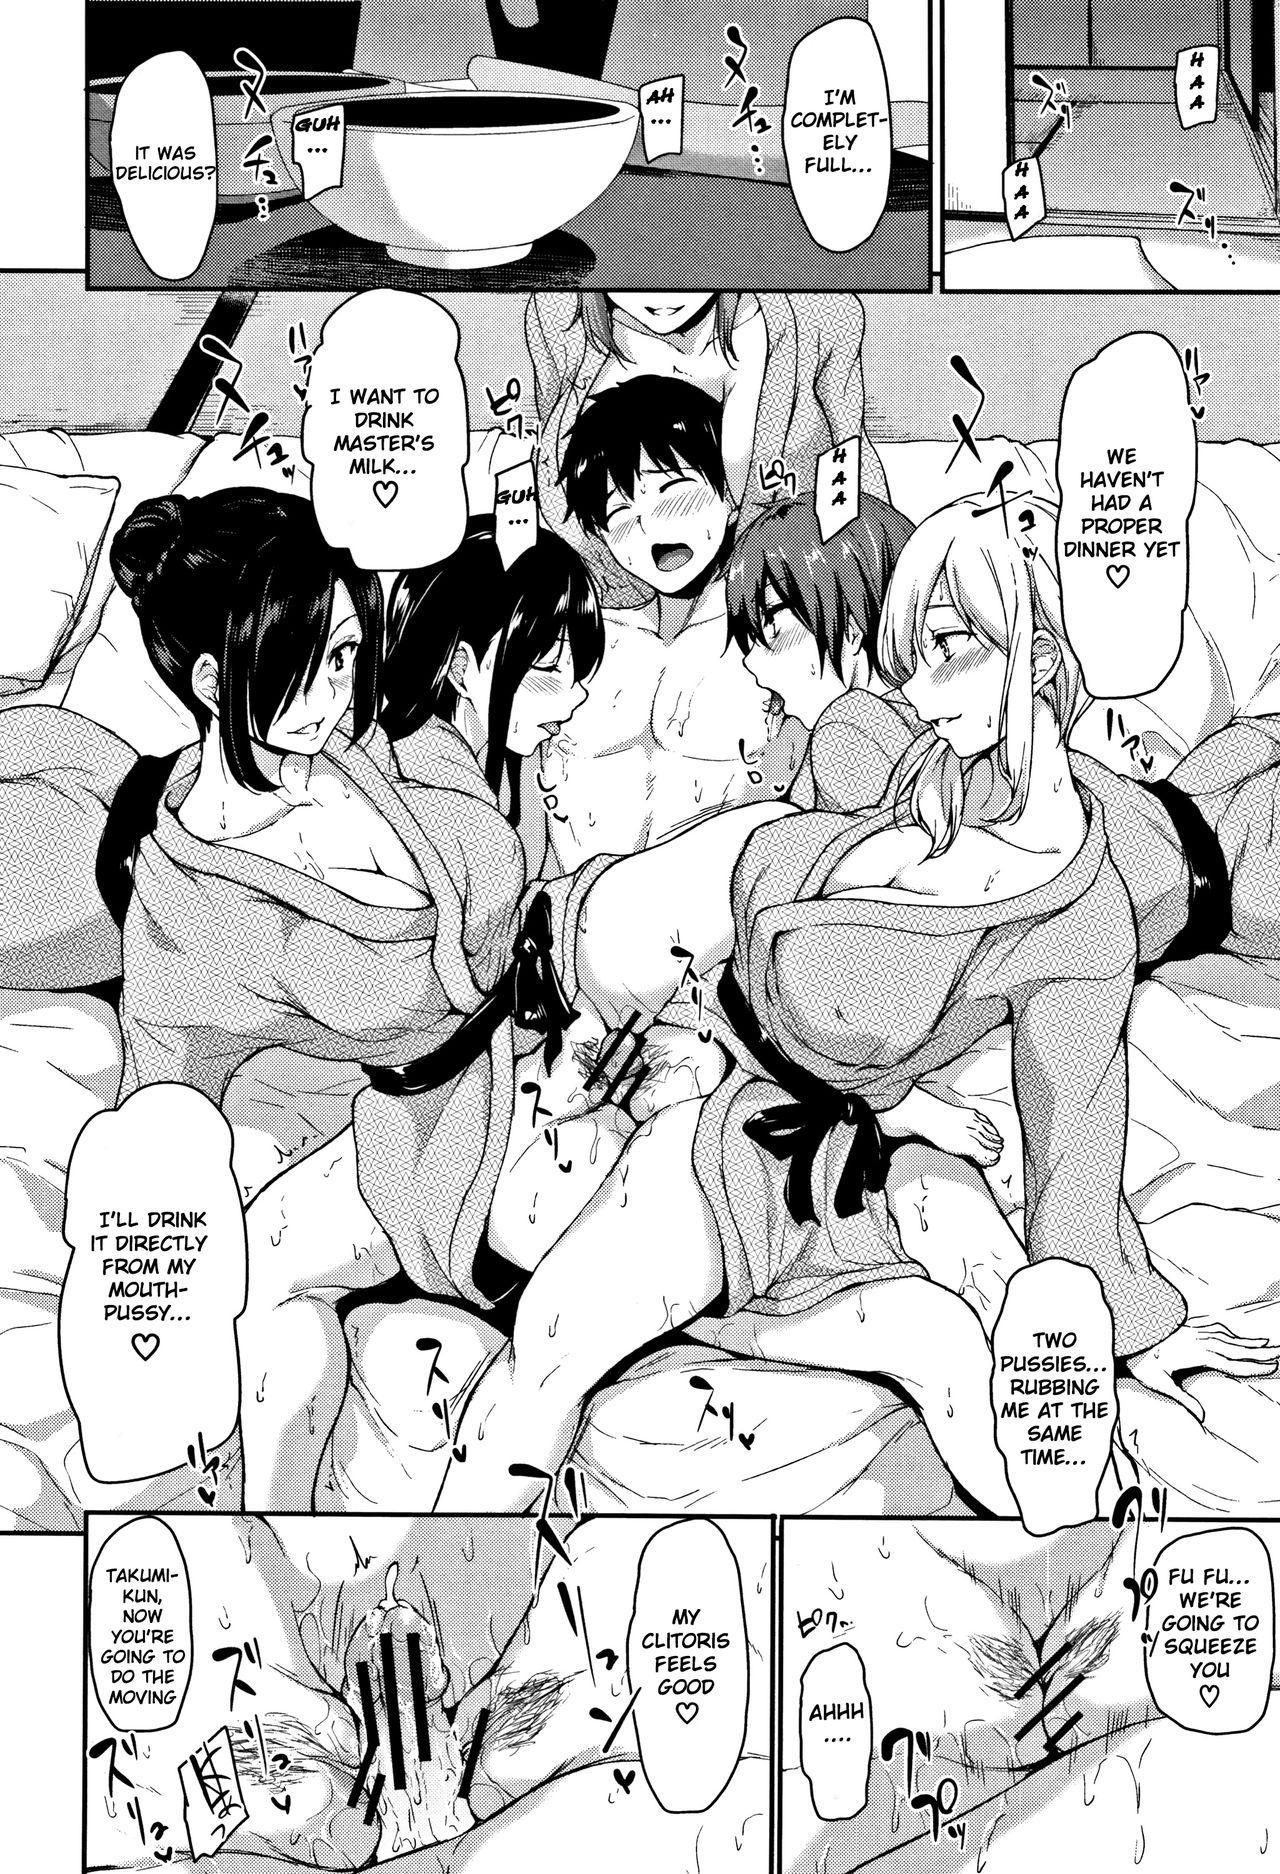 Yukemuri Harem Monogatari Saishuuwa | Yukemuri Harem Monogatari Final Chapter 25